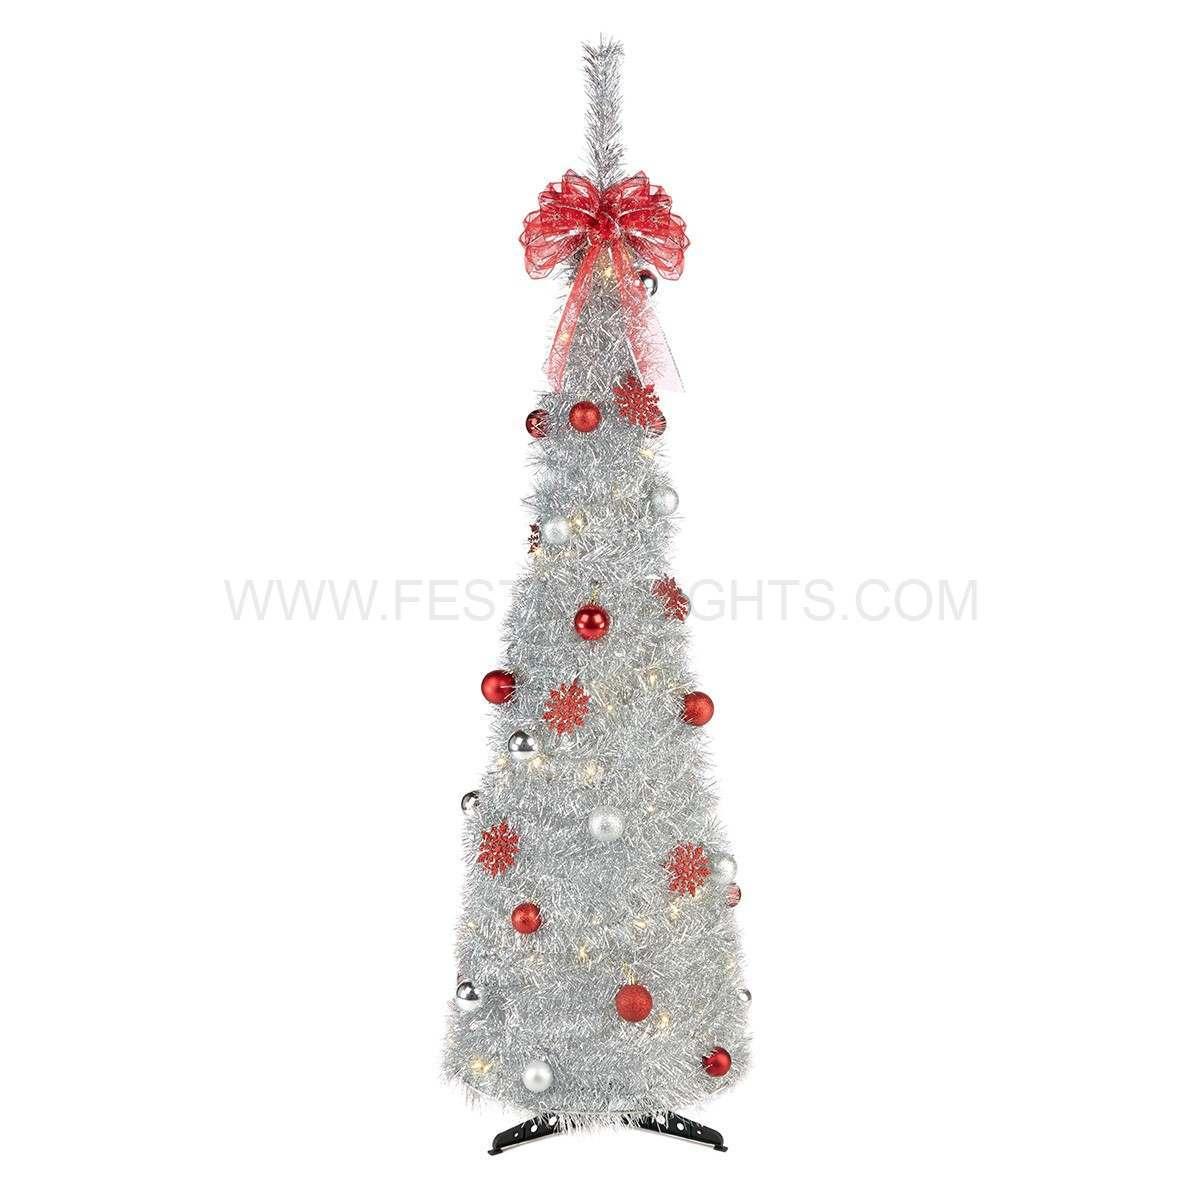 18m silver pre lit pop up christmas tree with decorations retail supplies villagefetes. Black Bedroom Furniture Sets. Home Design Ideas